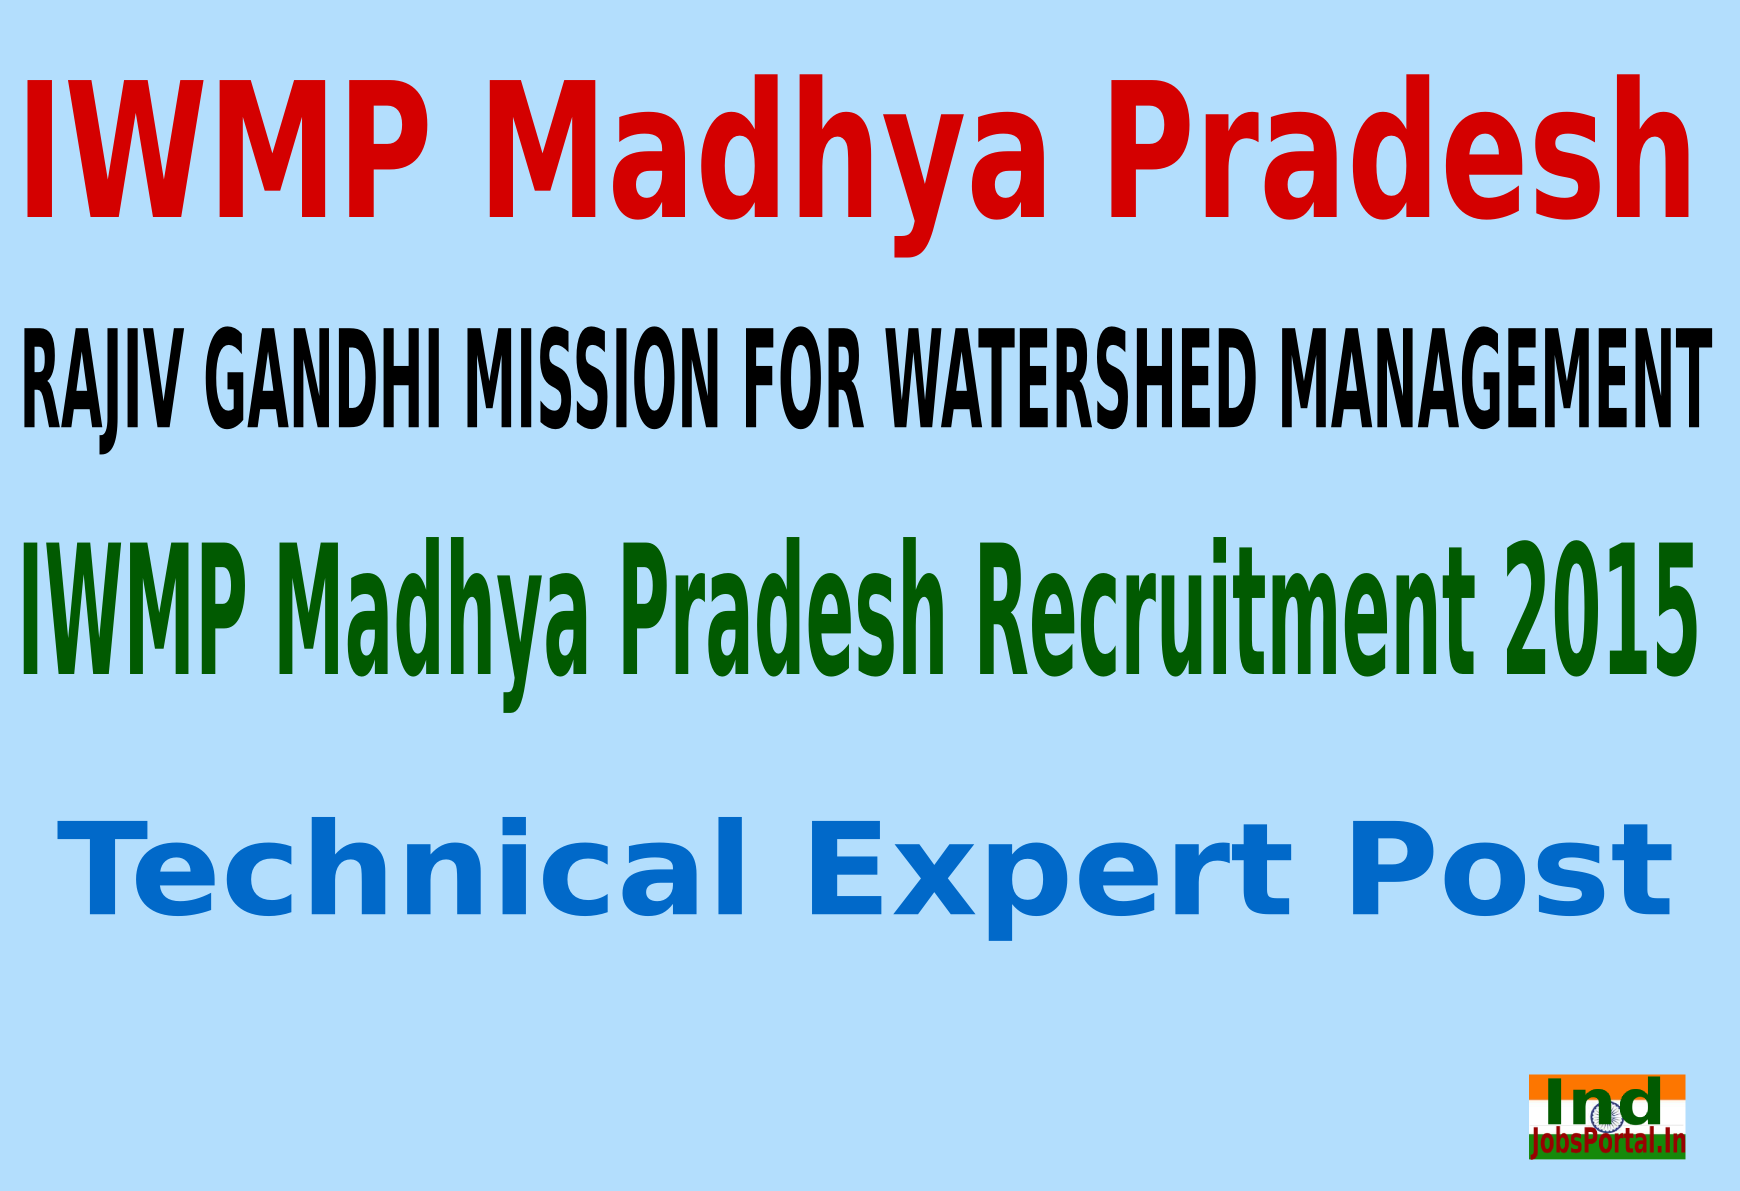 IWMP Madhya Pradesh Recruitment 2015 For 61 Technical Expert Post